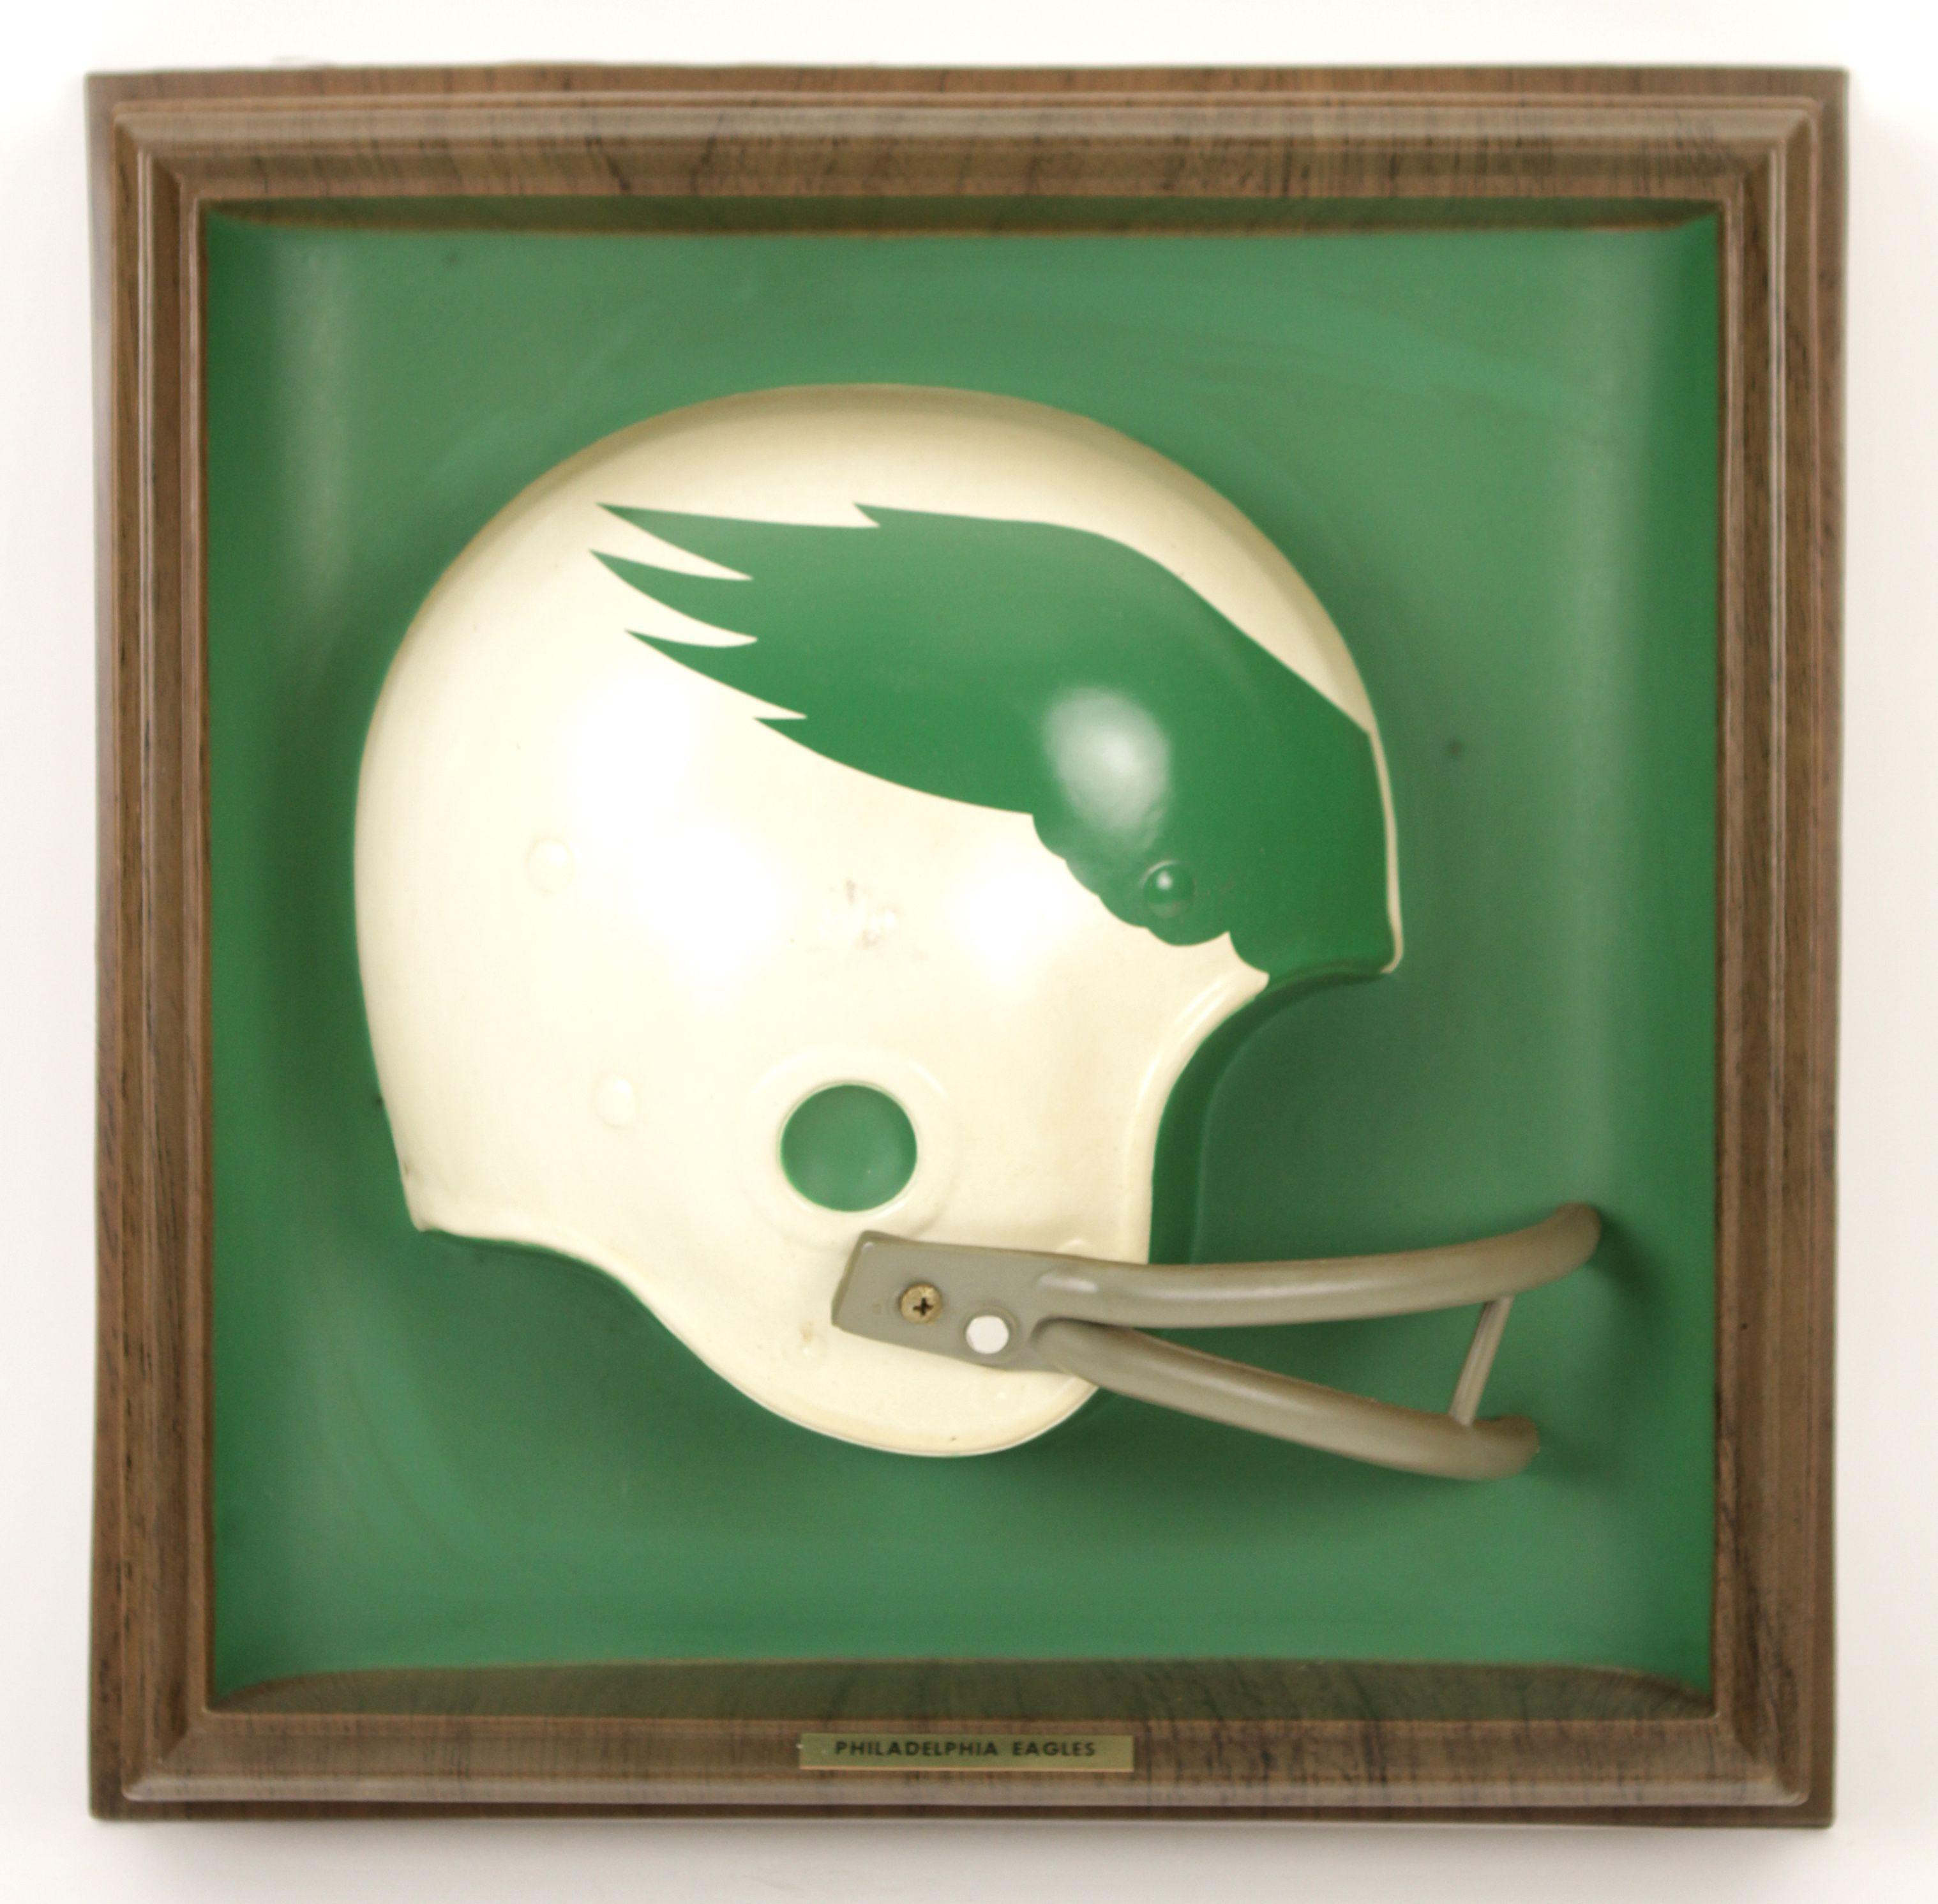 Lot Detail 1969 70 Circa Philadelphia Eagles Nfl Football Helmet Nfl Football Helmets Eagles Nfl Football Helmets